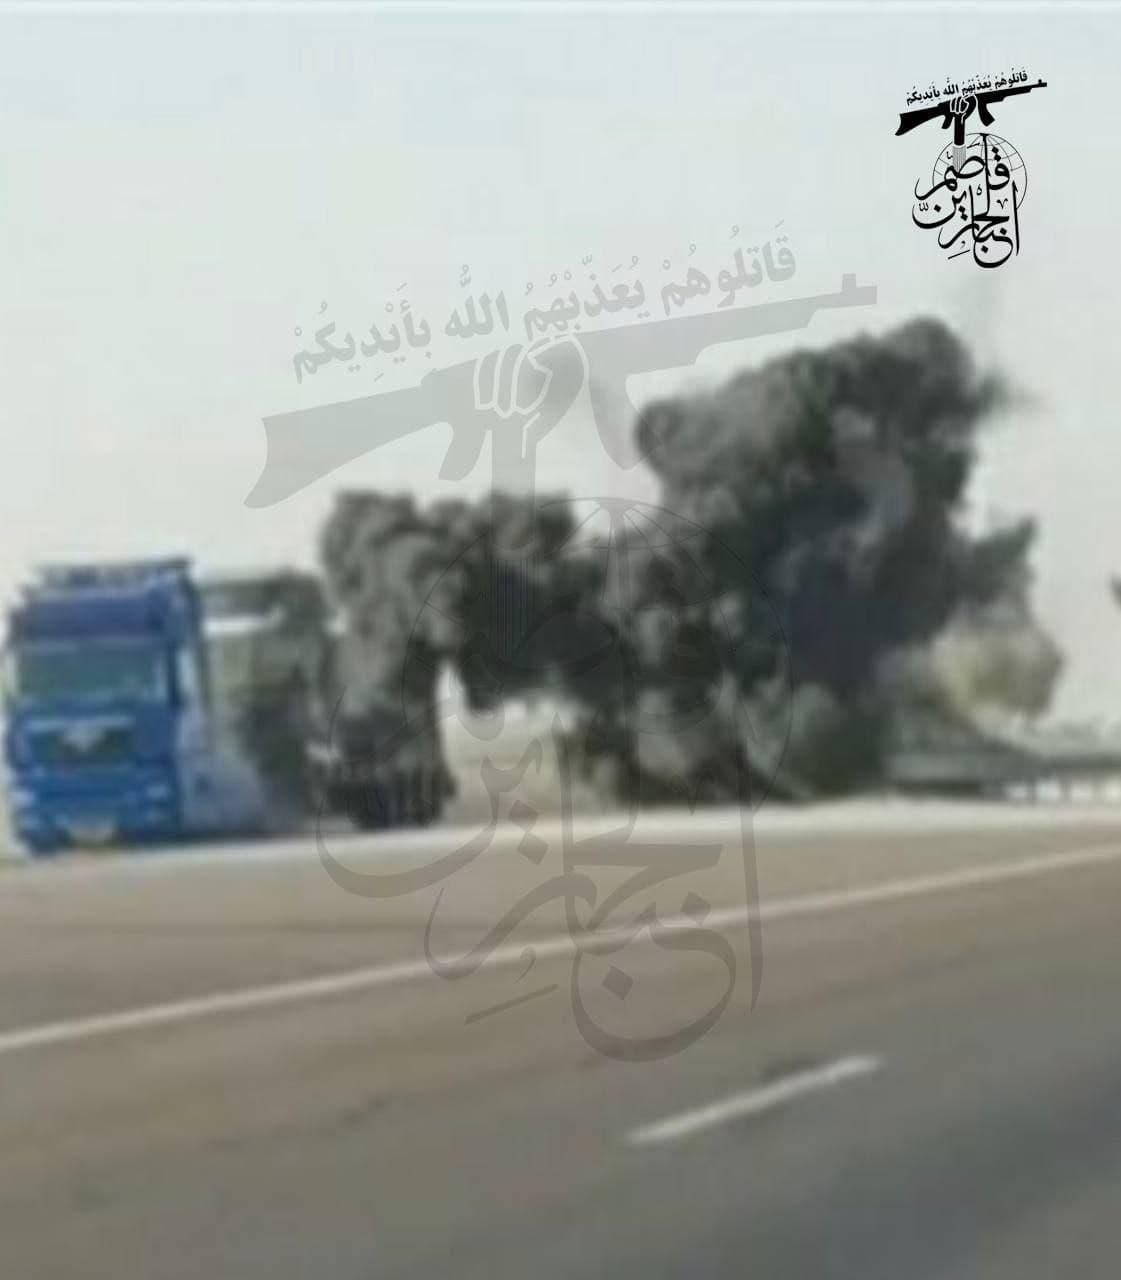 Iraqi 'Resistance' Group Attacked Four US Supply Convoys In Dhi Qar, Al-Diwaniyah & Babylon (Video, Photos)